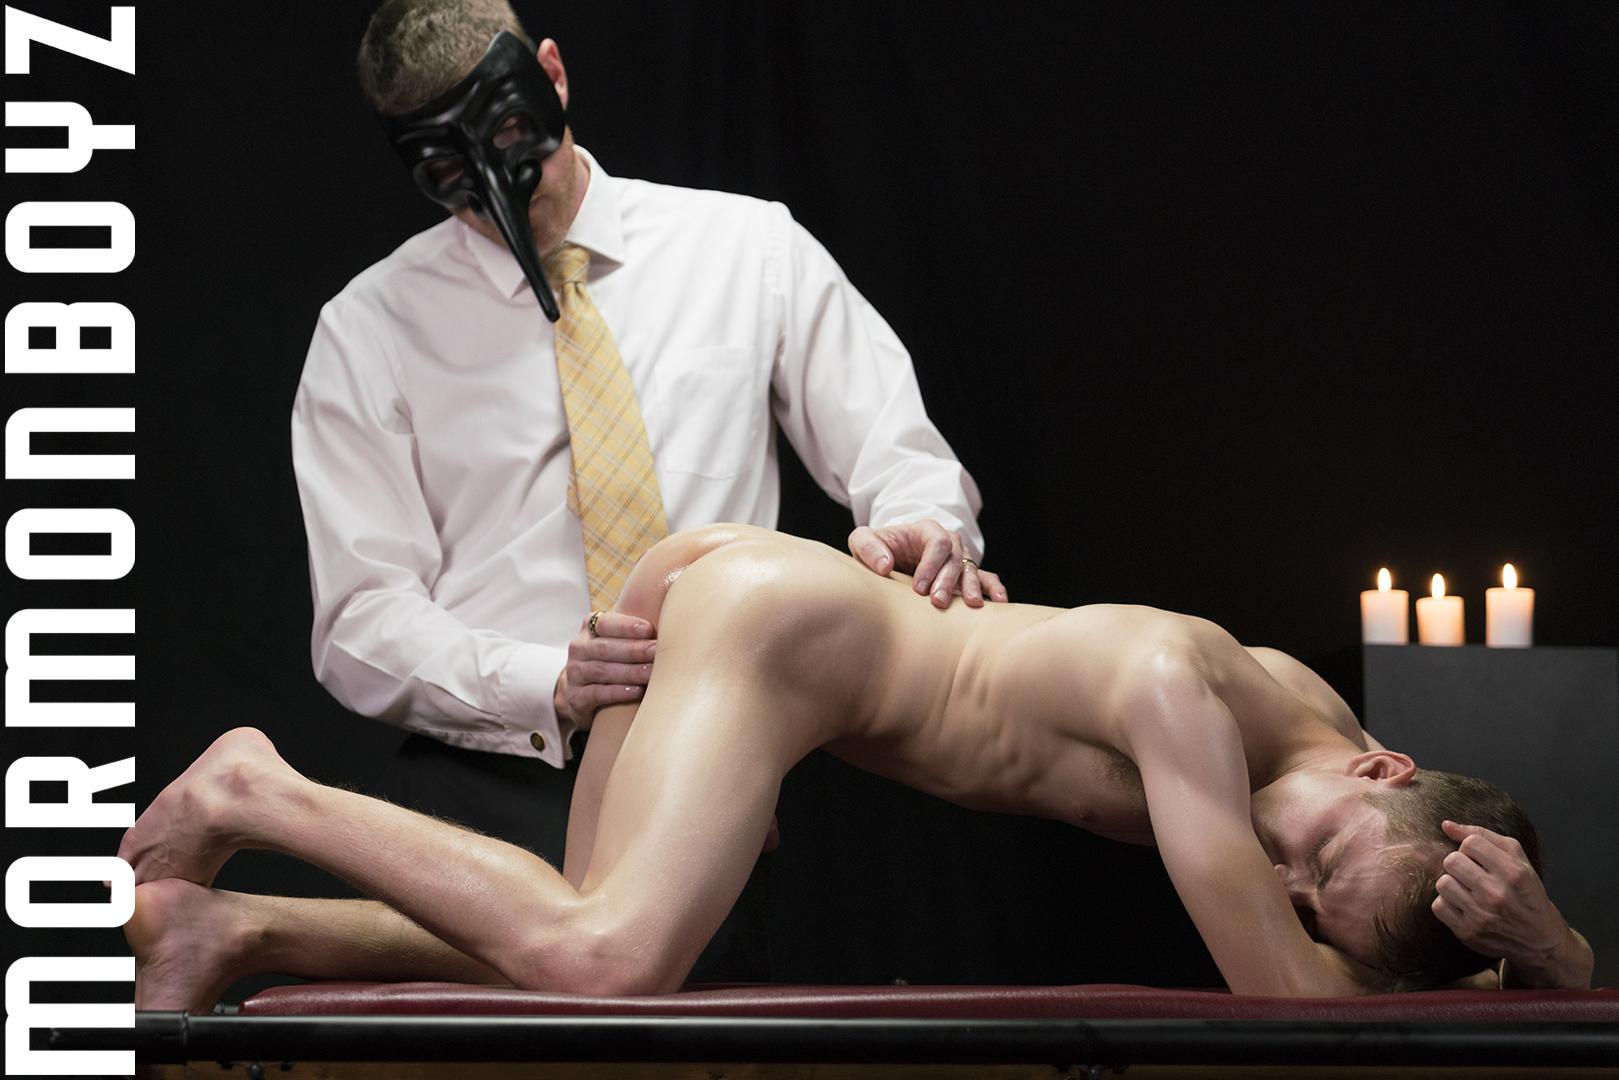 170820_mbz_07-mormonboyz-gay-daddy-son-sex_pic13